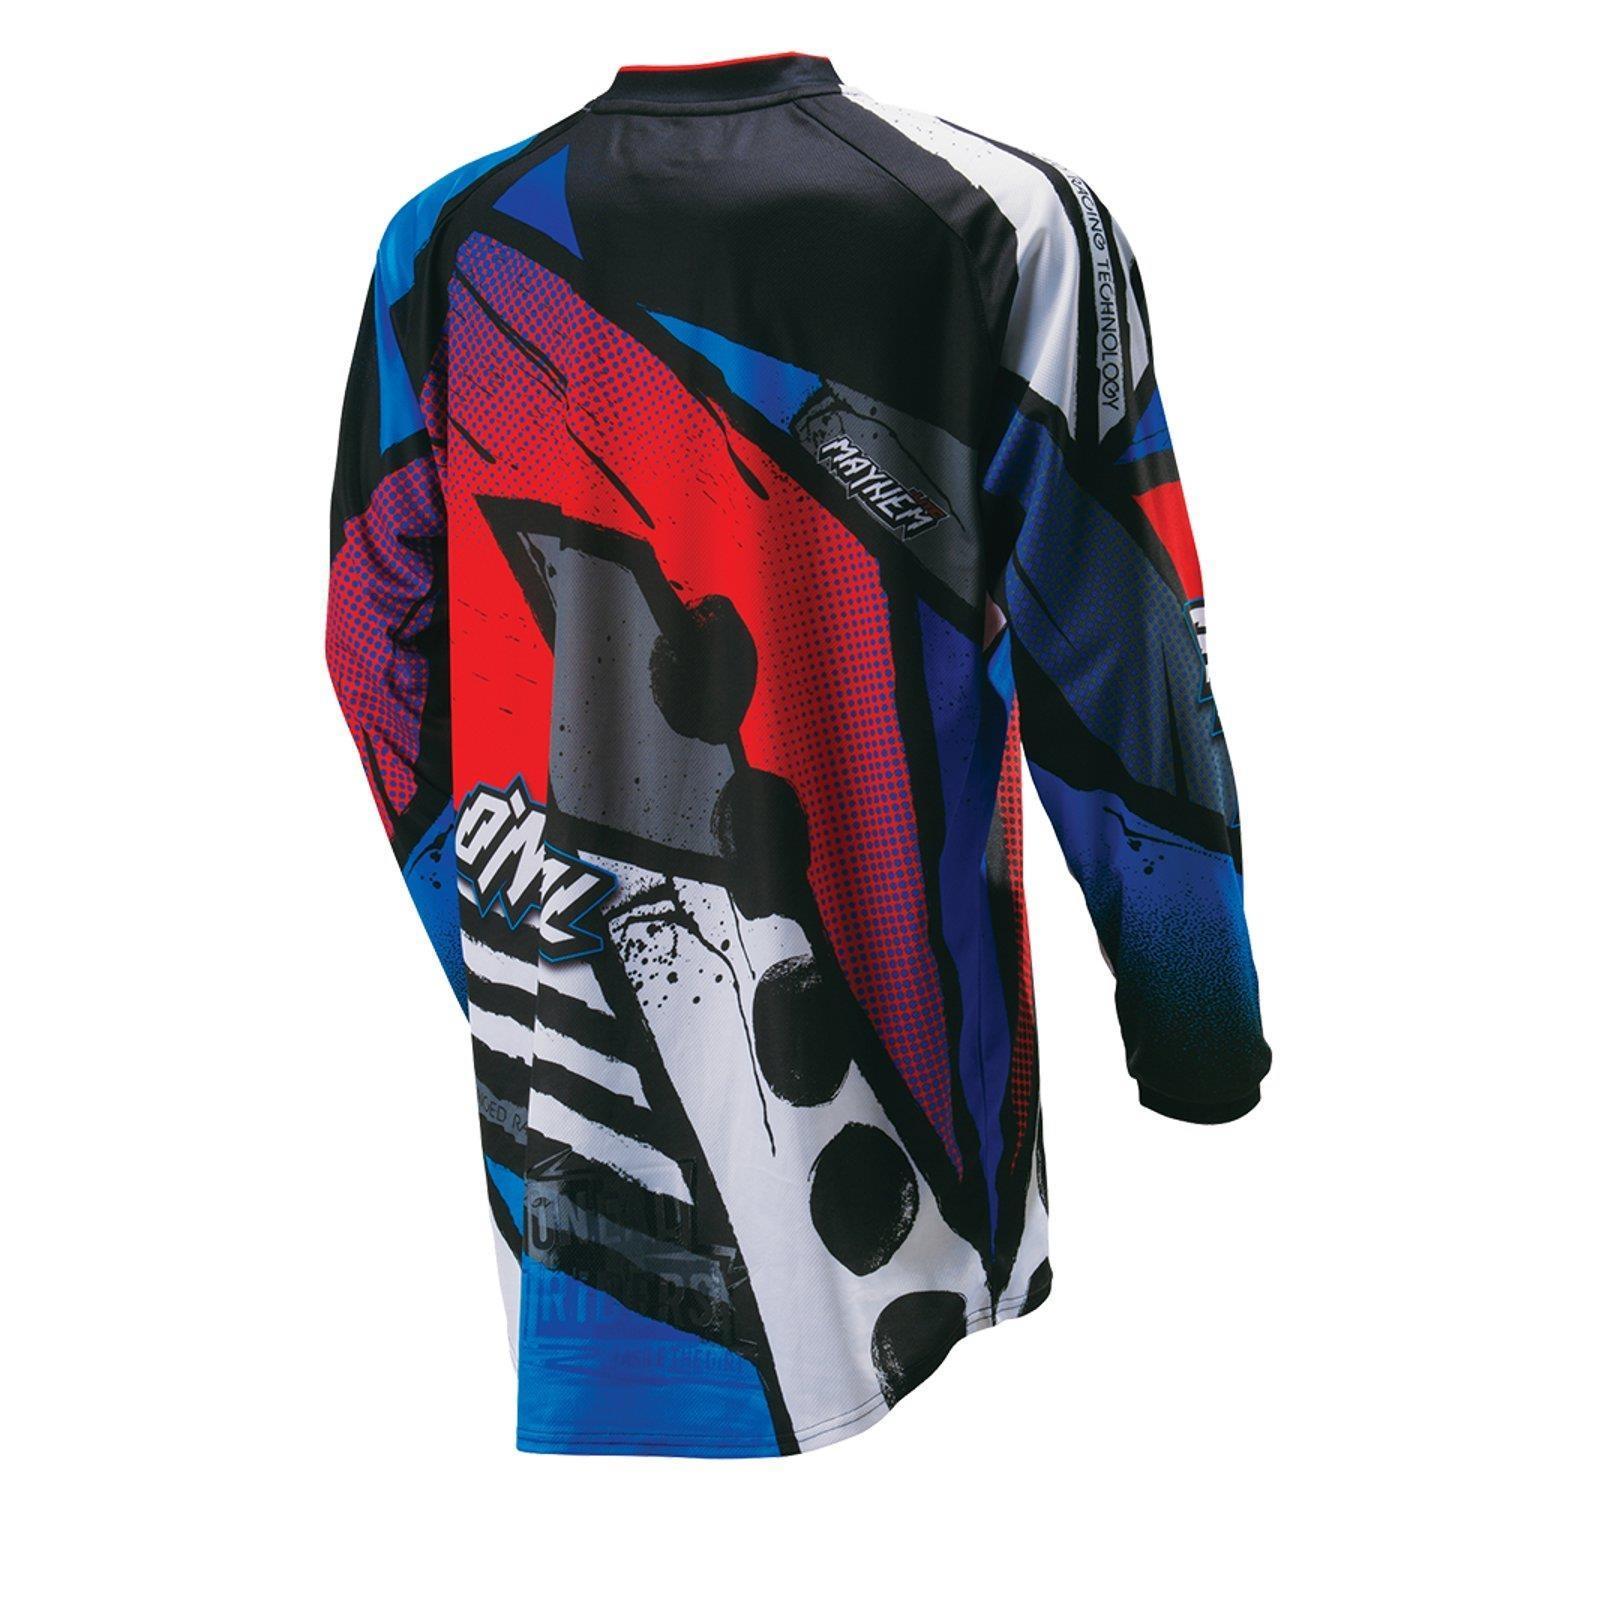 O-039-Neal-elemento-Mayhem-JERSEY-Racewear-Motocross-Maglia-MX-DH-FR-MTB-MOUNTAIN-BIKE miniatura 90